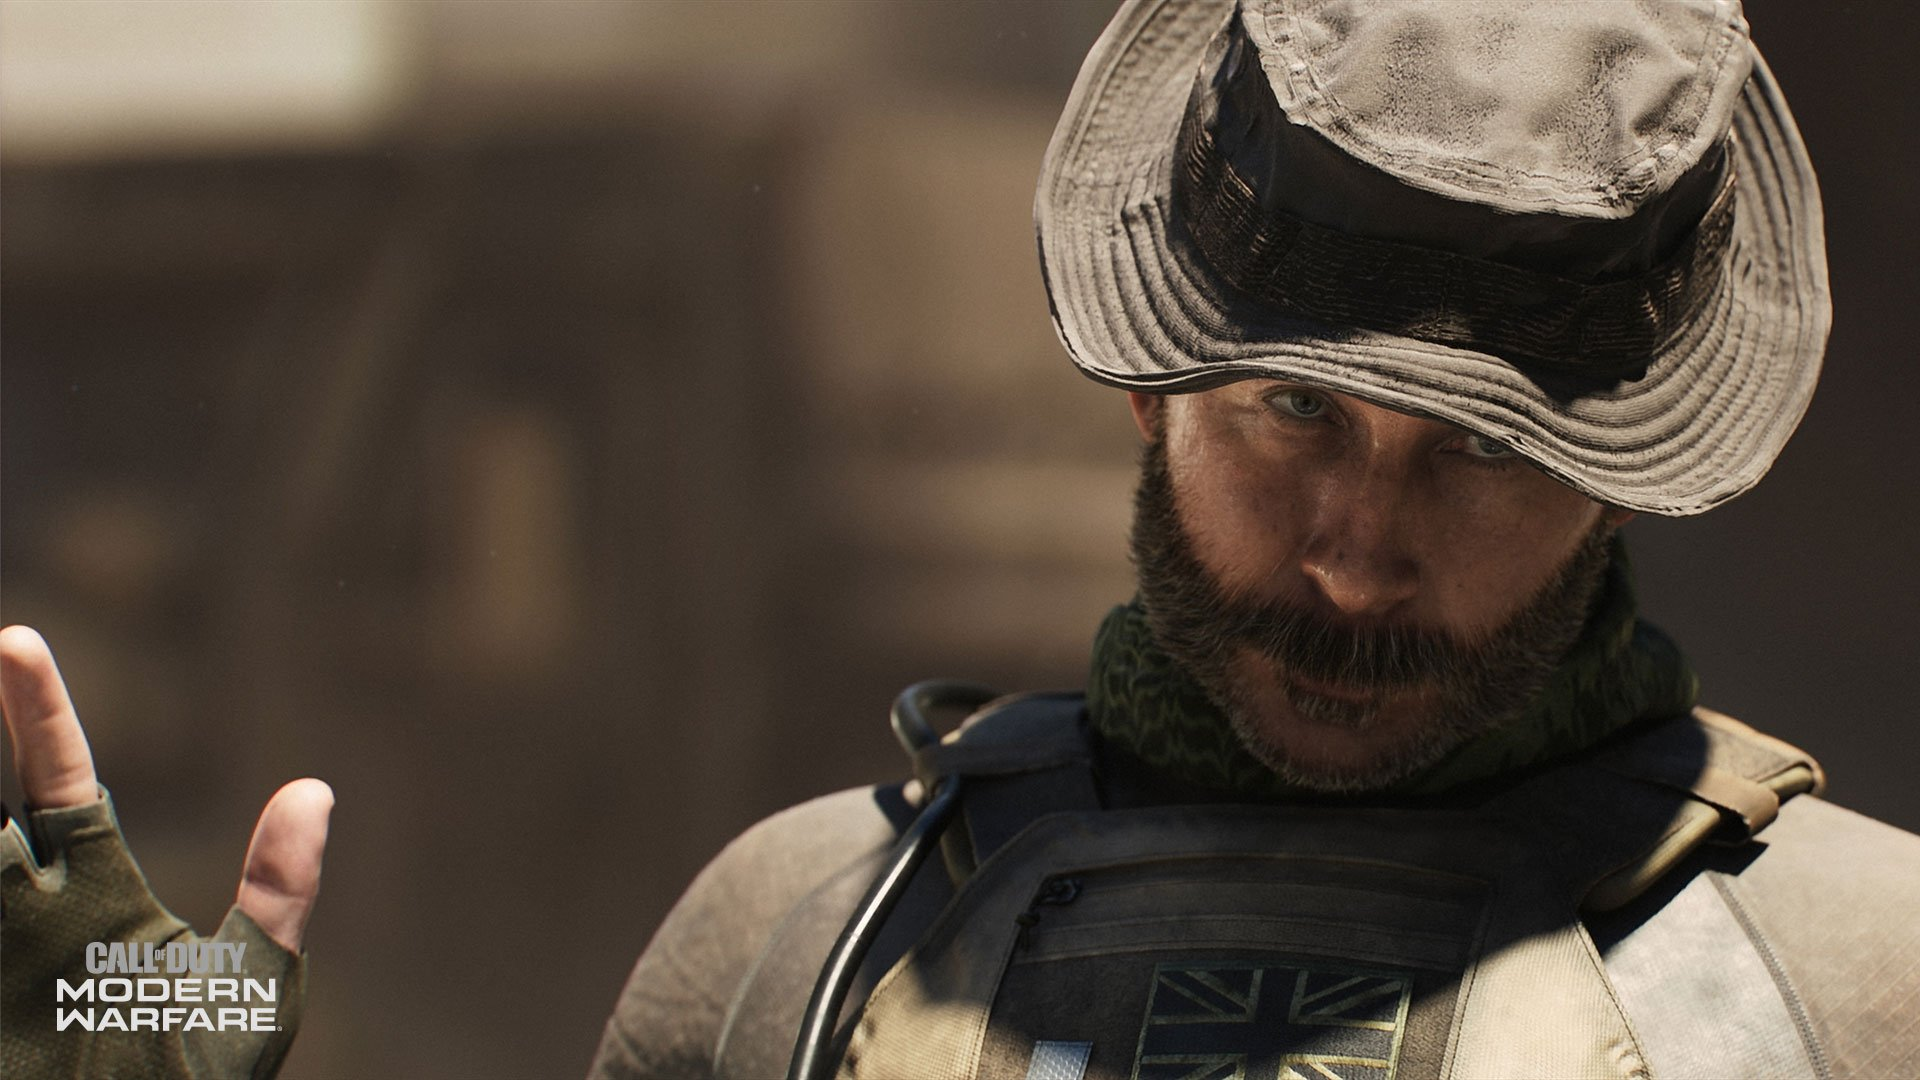 Call Of Duty: Modern Warfare quietly brings back a fan-favourite map